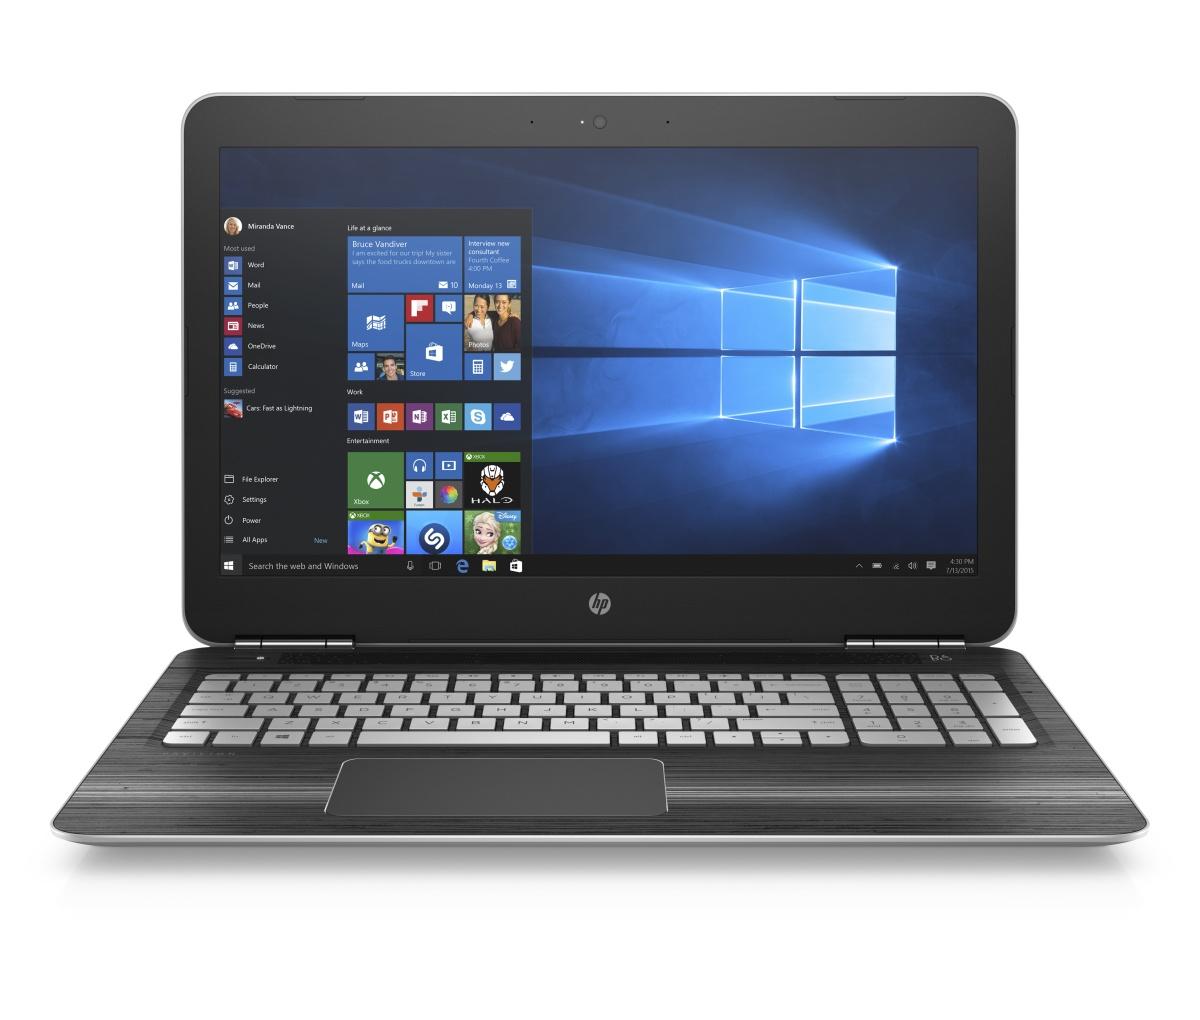 "HP Pavilion gaming 15-bc200nc/Intel i7-7700HQ/8GB/128 GB SSD M.2 + 1TB/DVDRW/ GTX 1050 4GB/15,6"" FHD/Win 10/stříbrná"